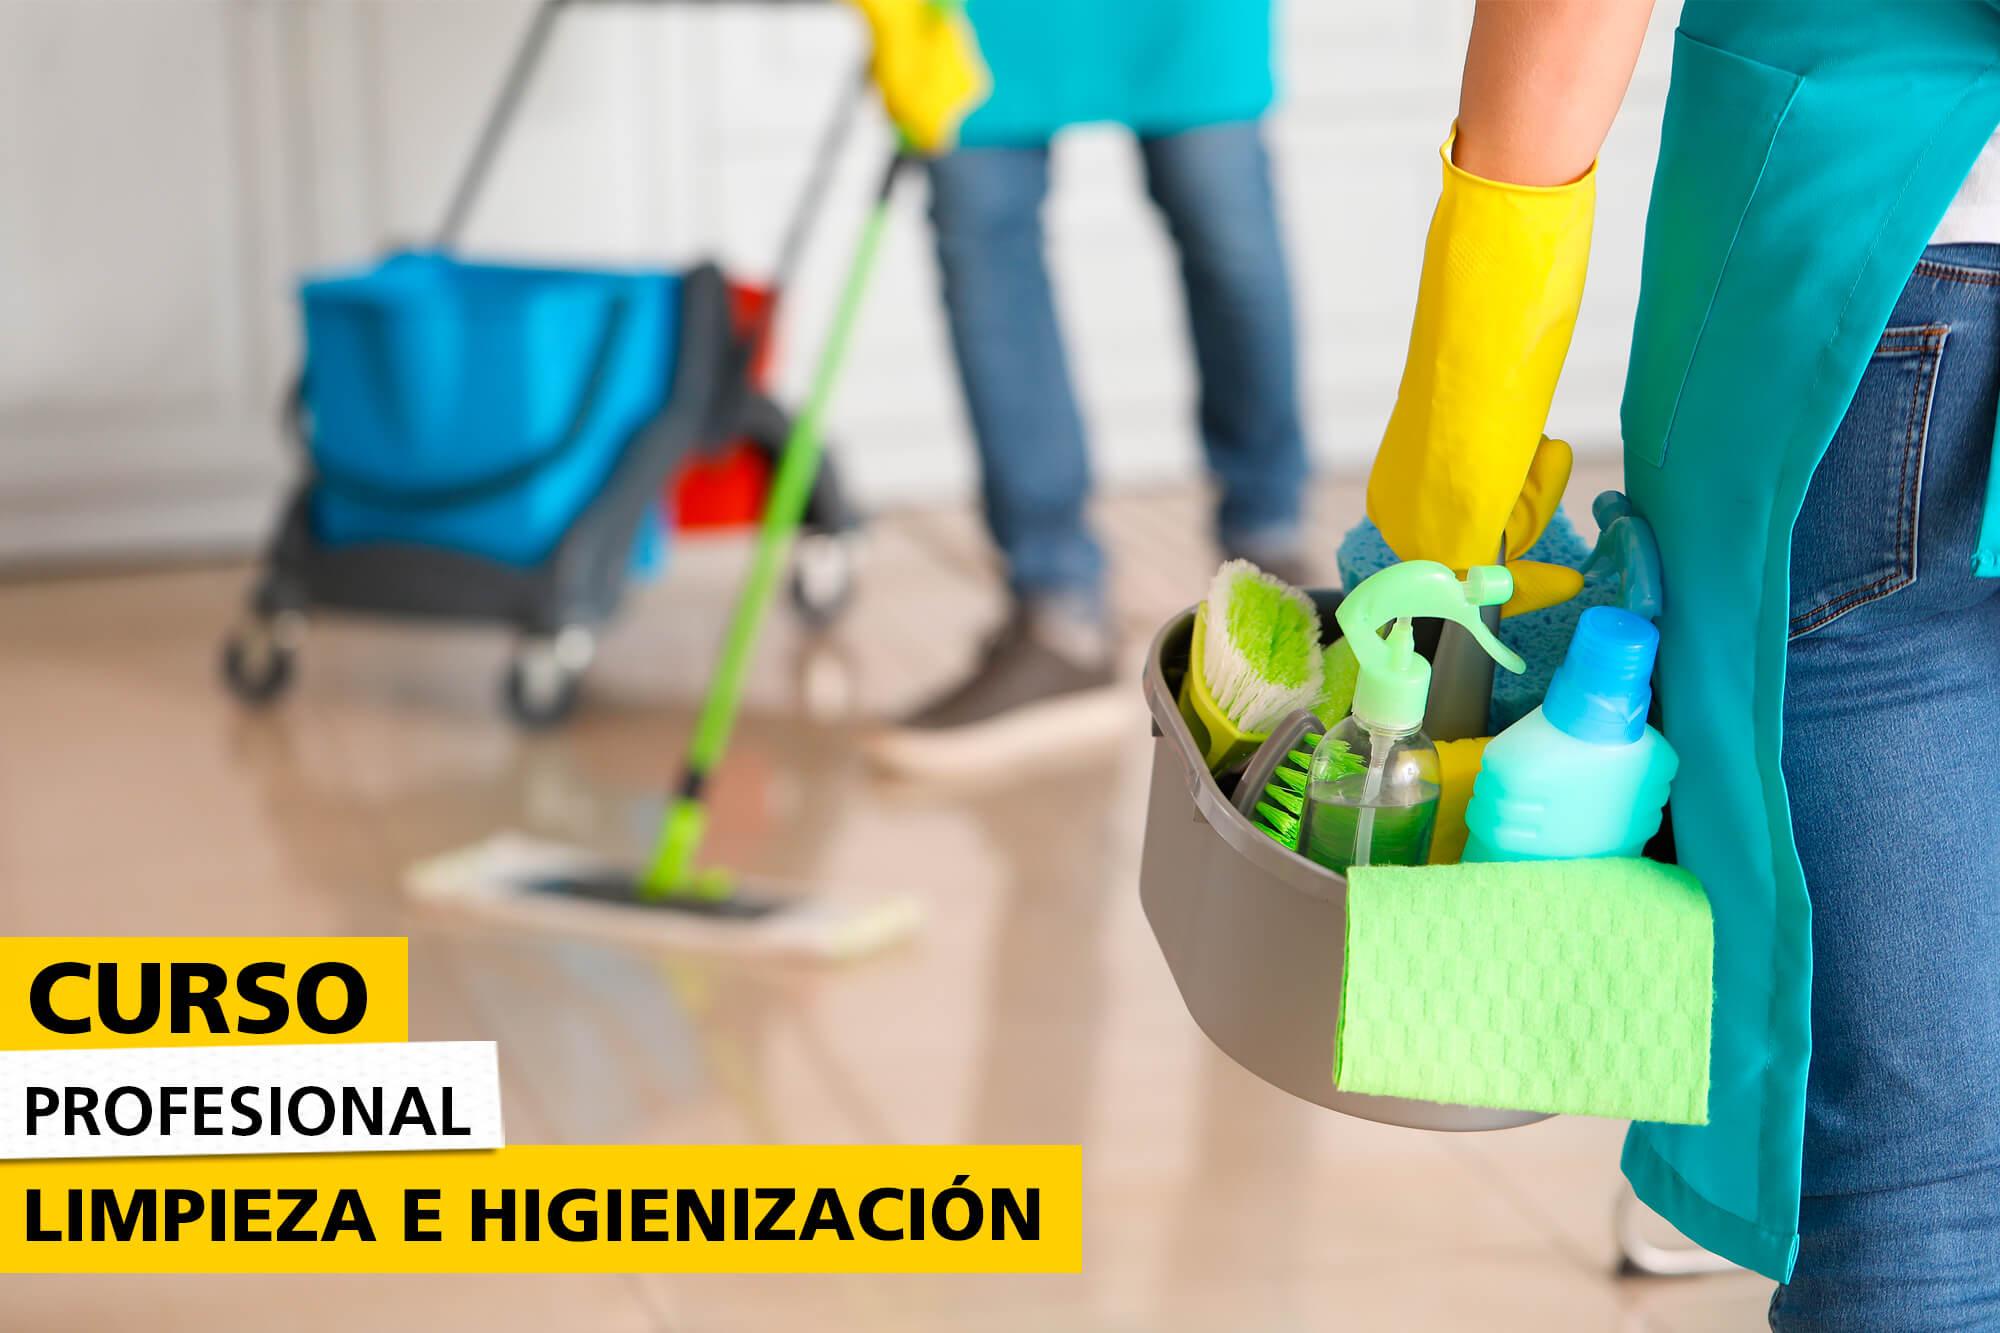 img-destacada-curso-profesional-limpieza-higuienizacion